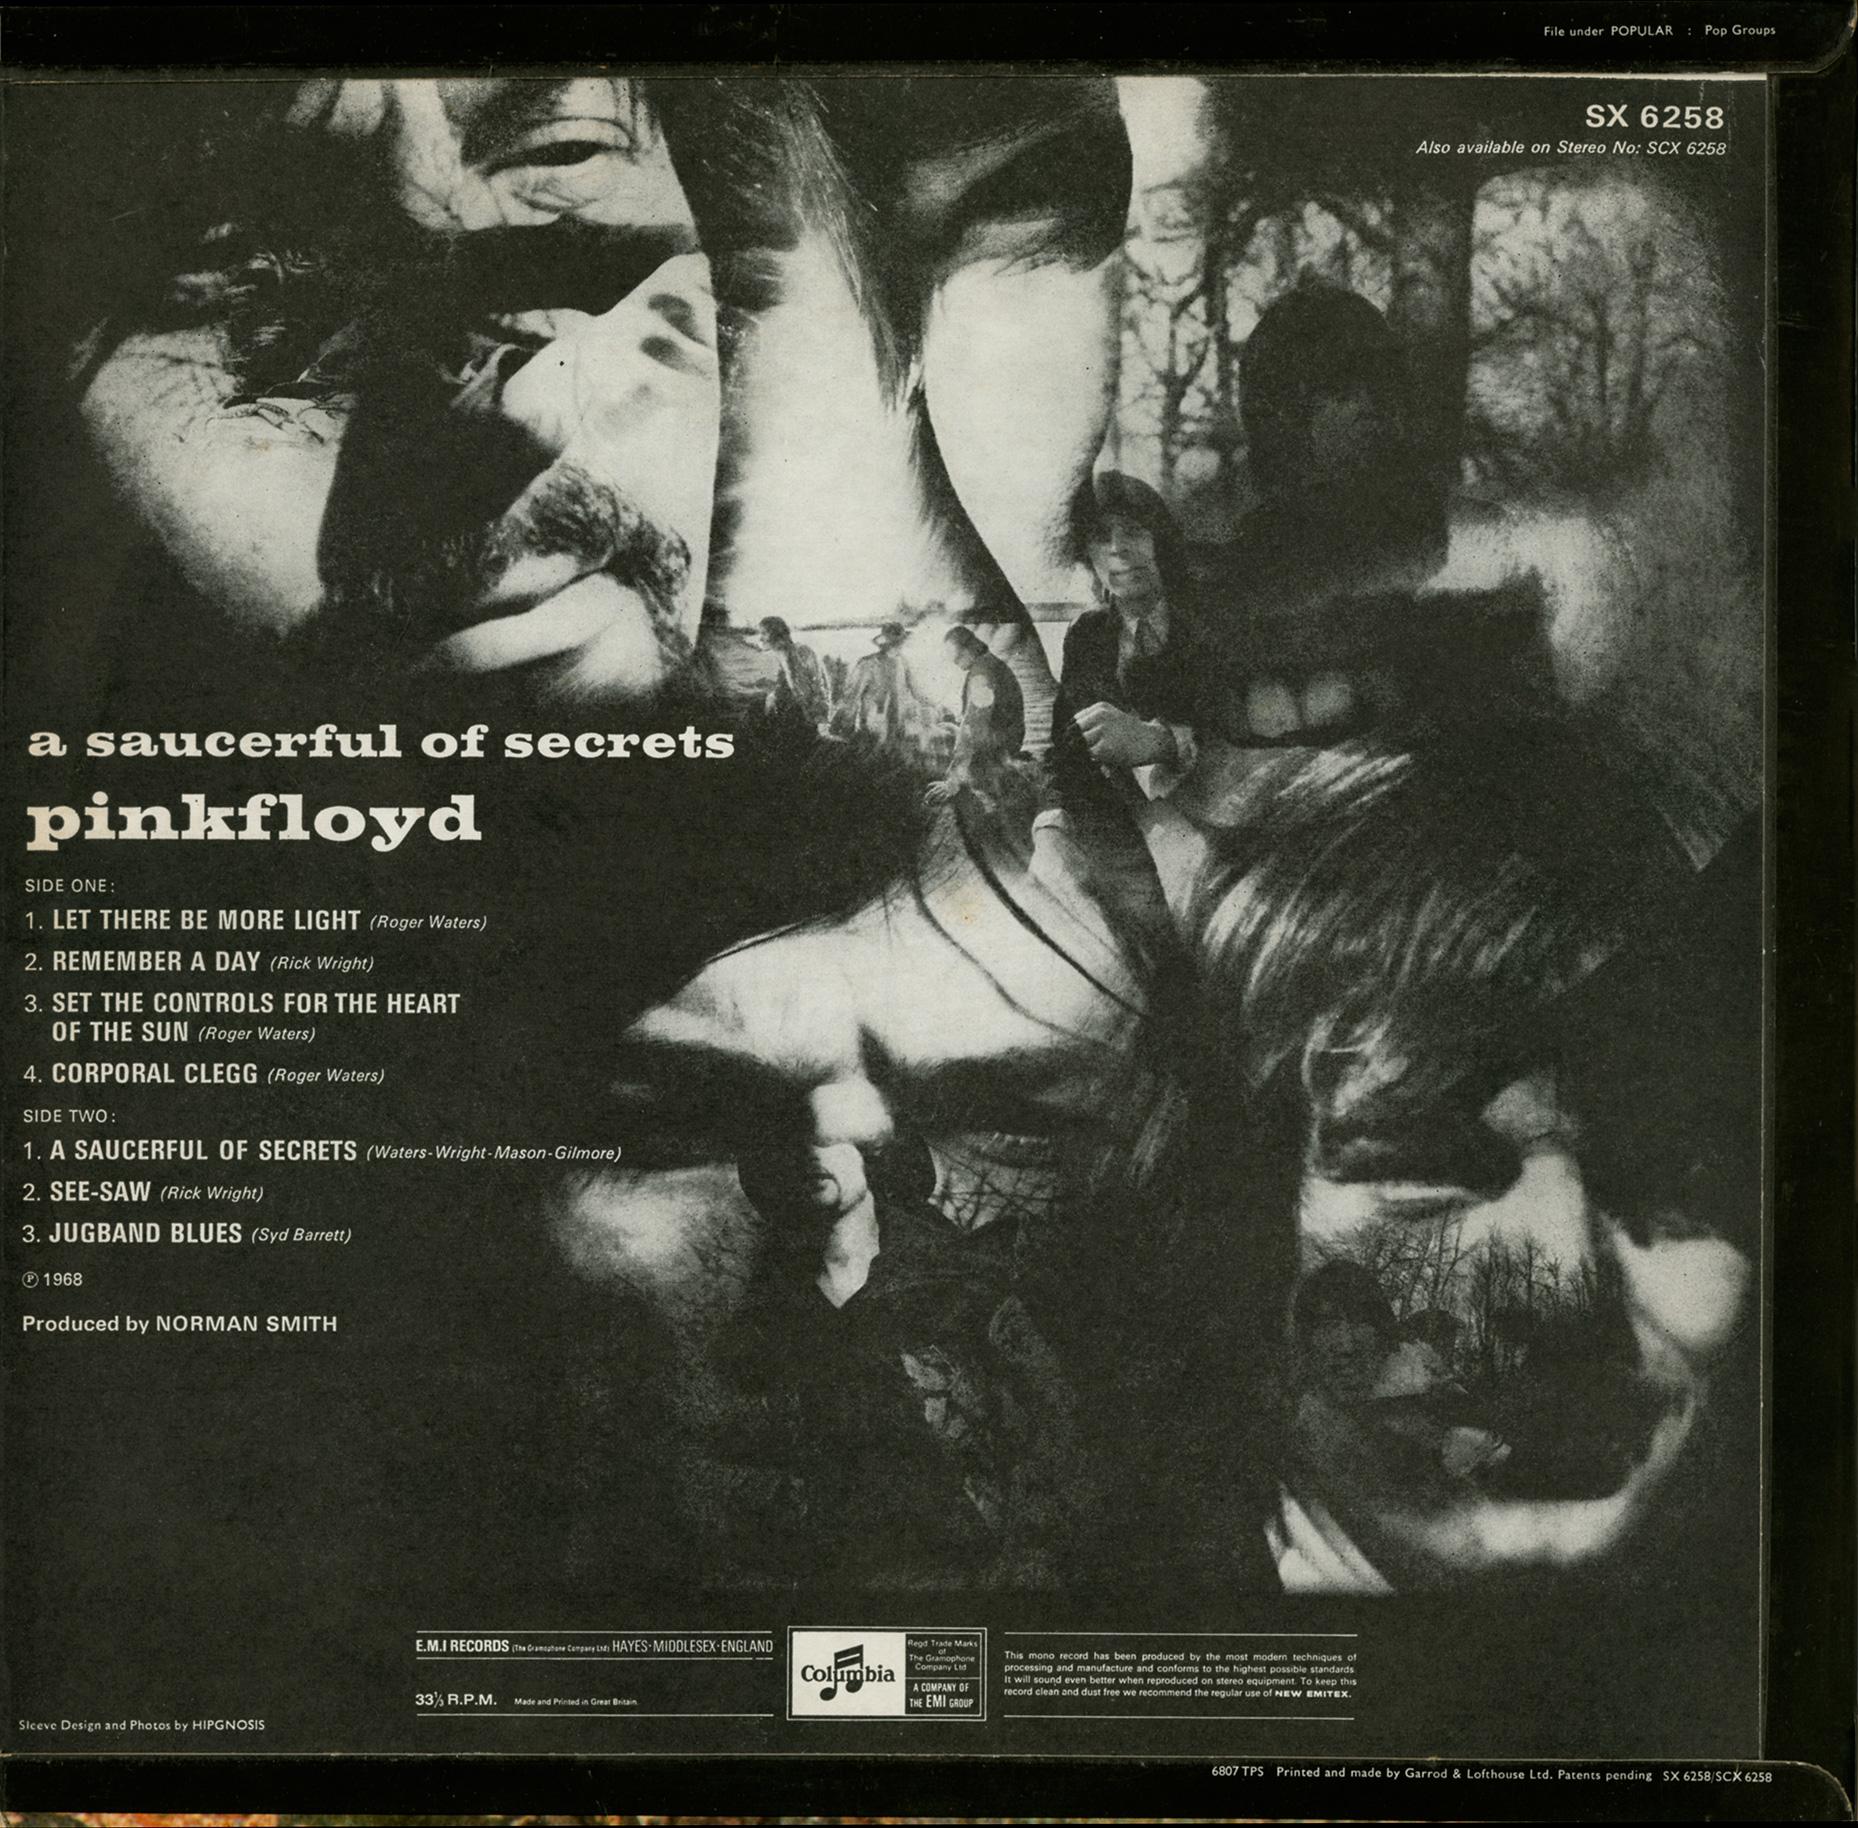 1968 - A SAUCERFUL OF SECRETS [PINK FLOYD] [Album STUDIO]   BC